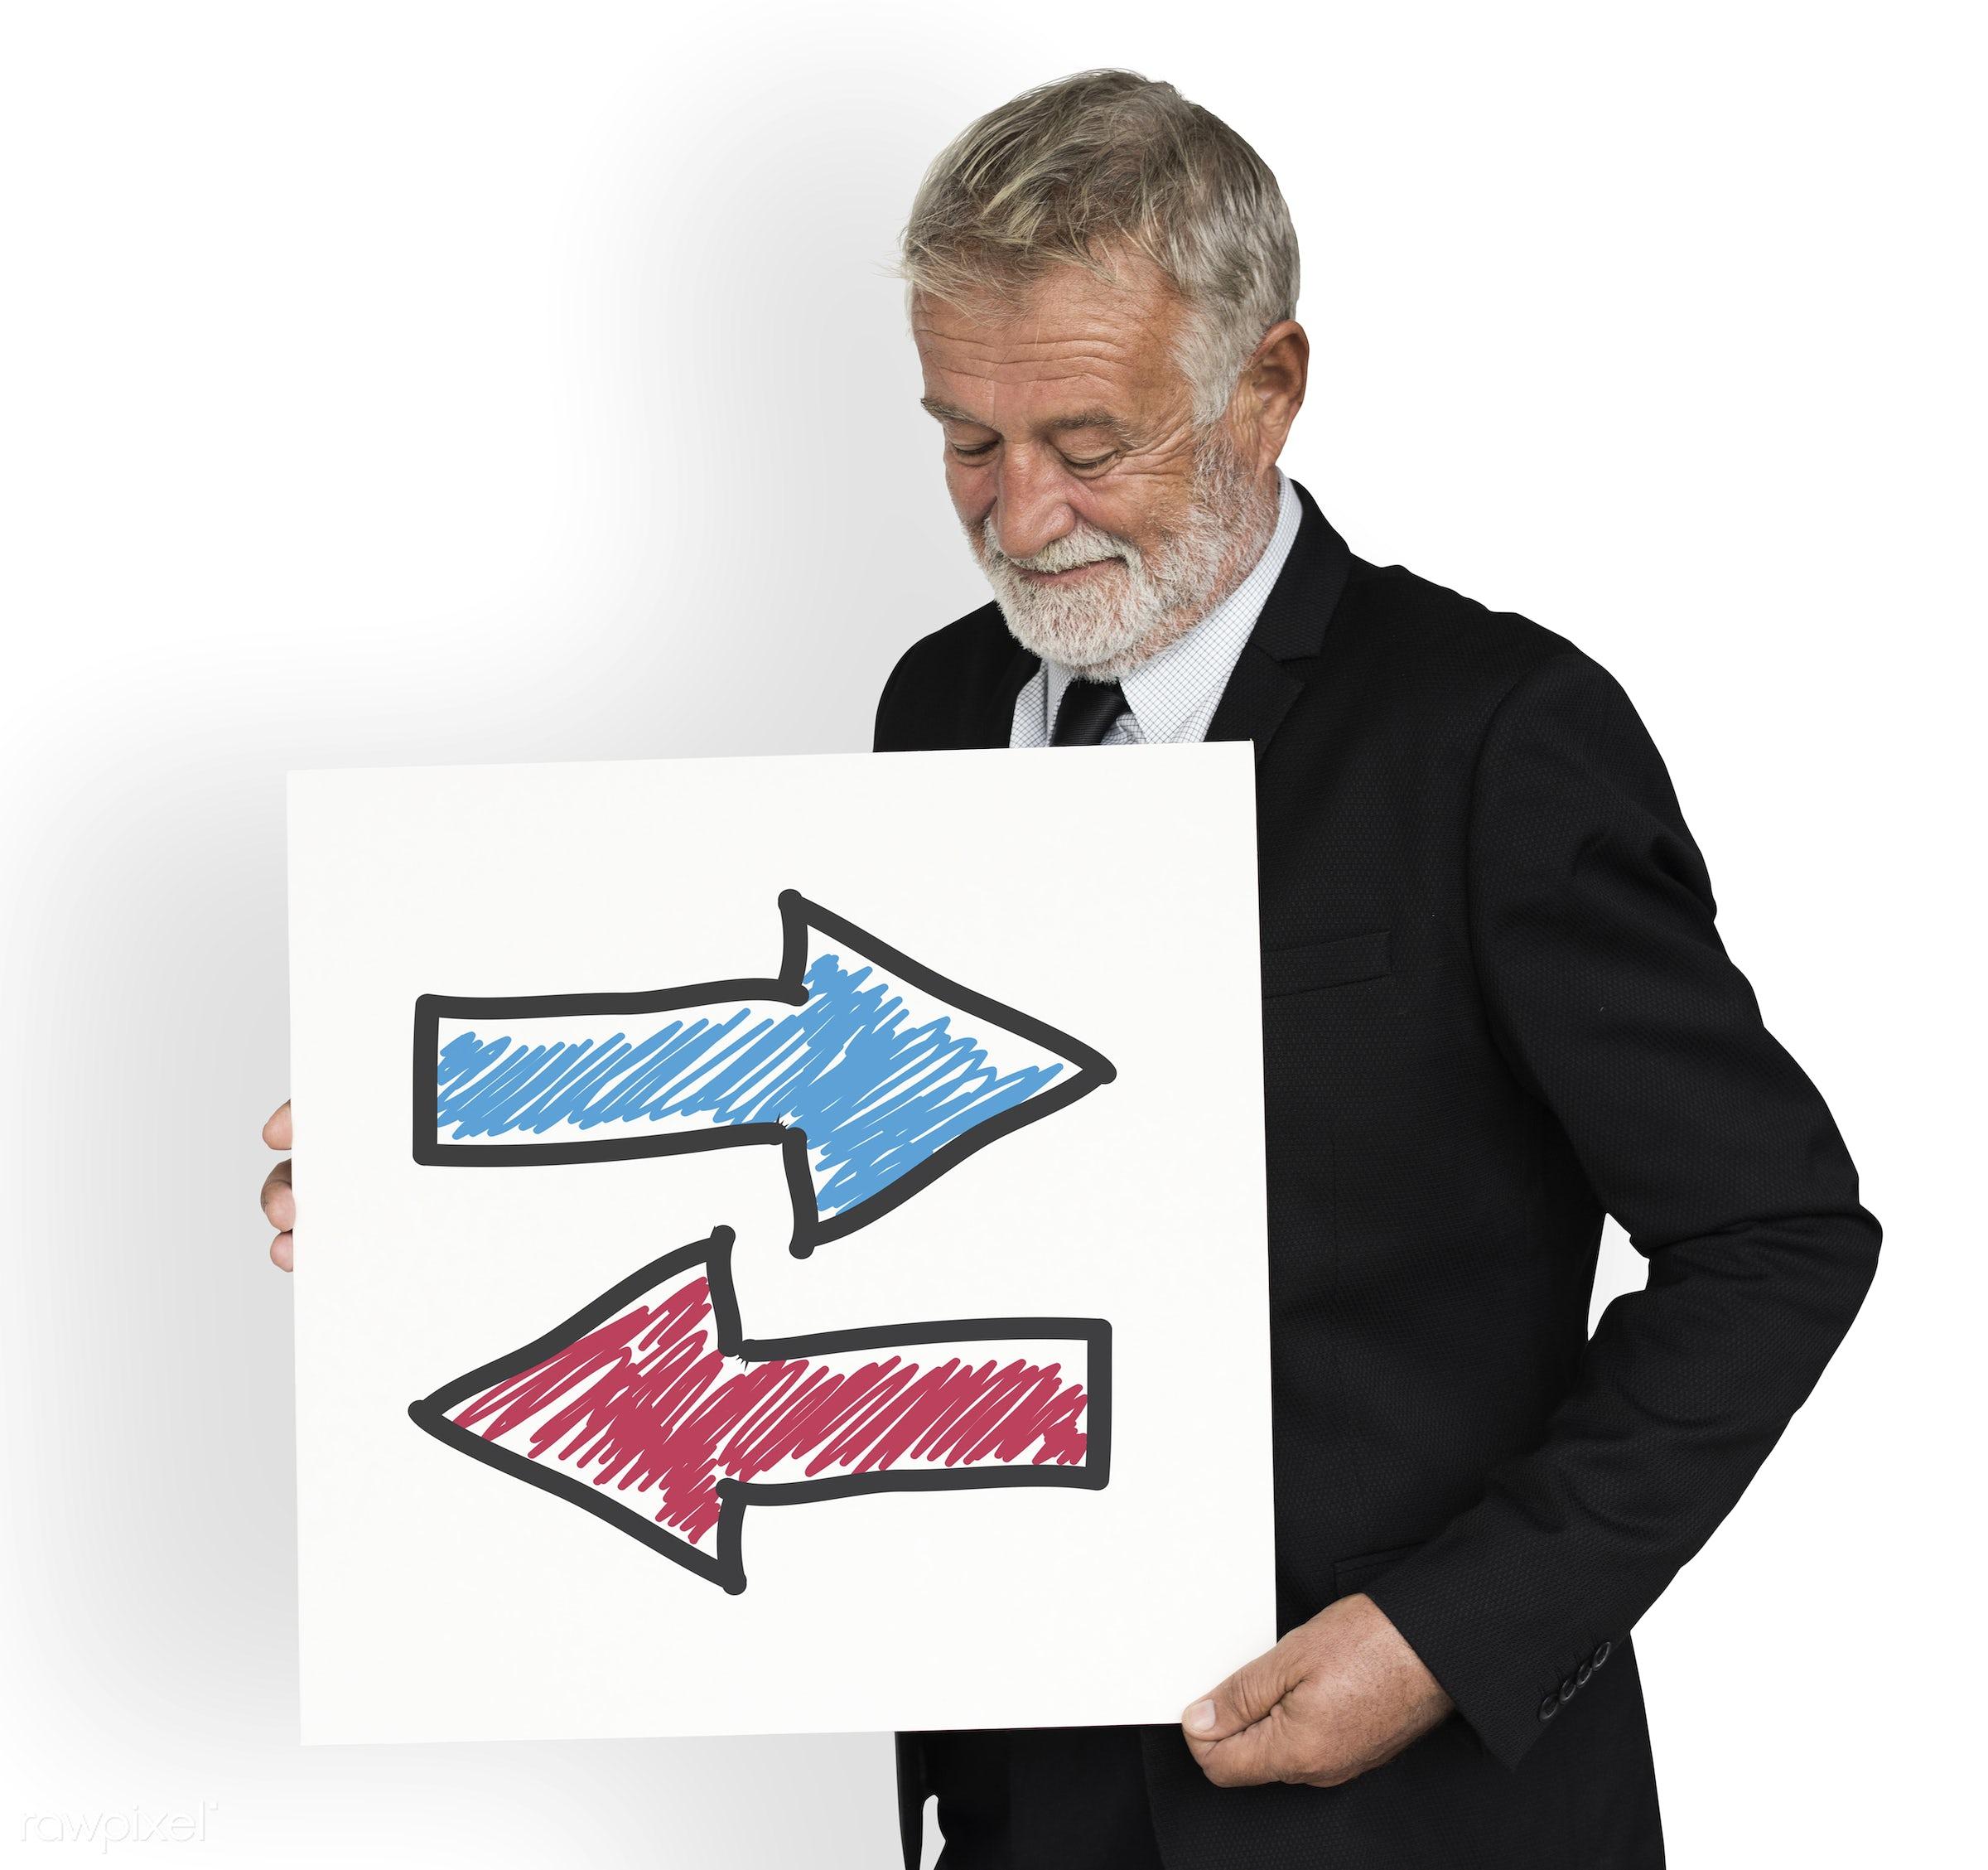 arrows, background, briefing, business, business attire, business man, business wear, cloud, communication, concept,...